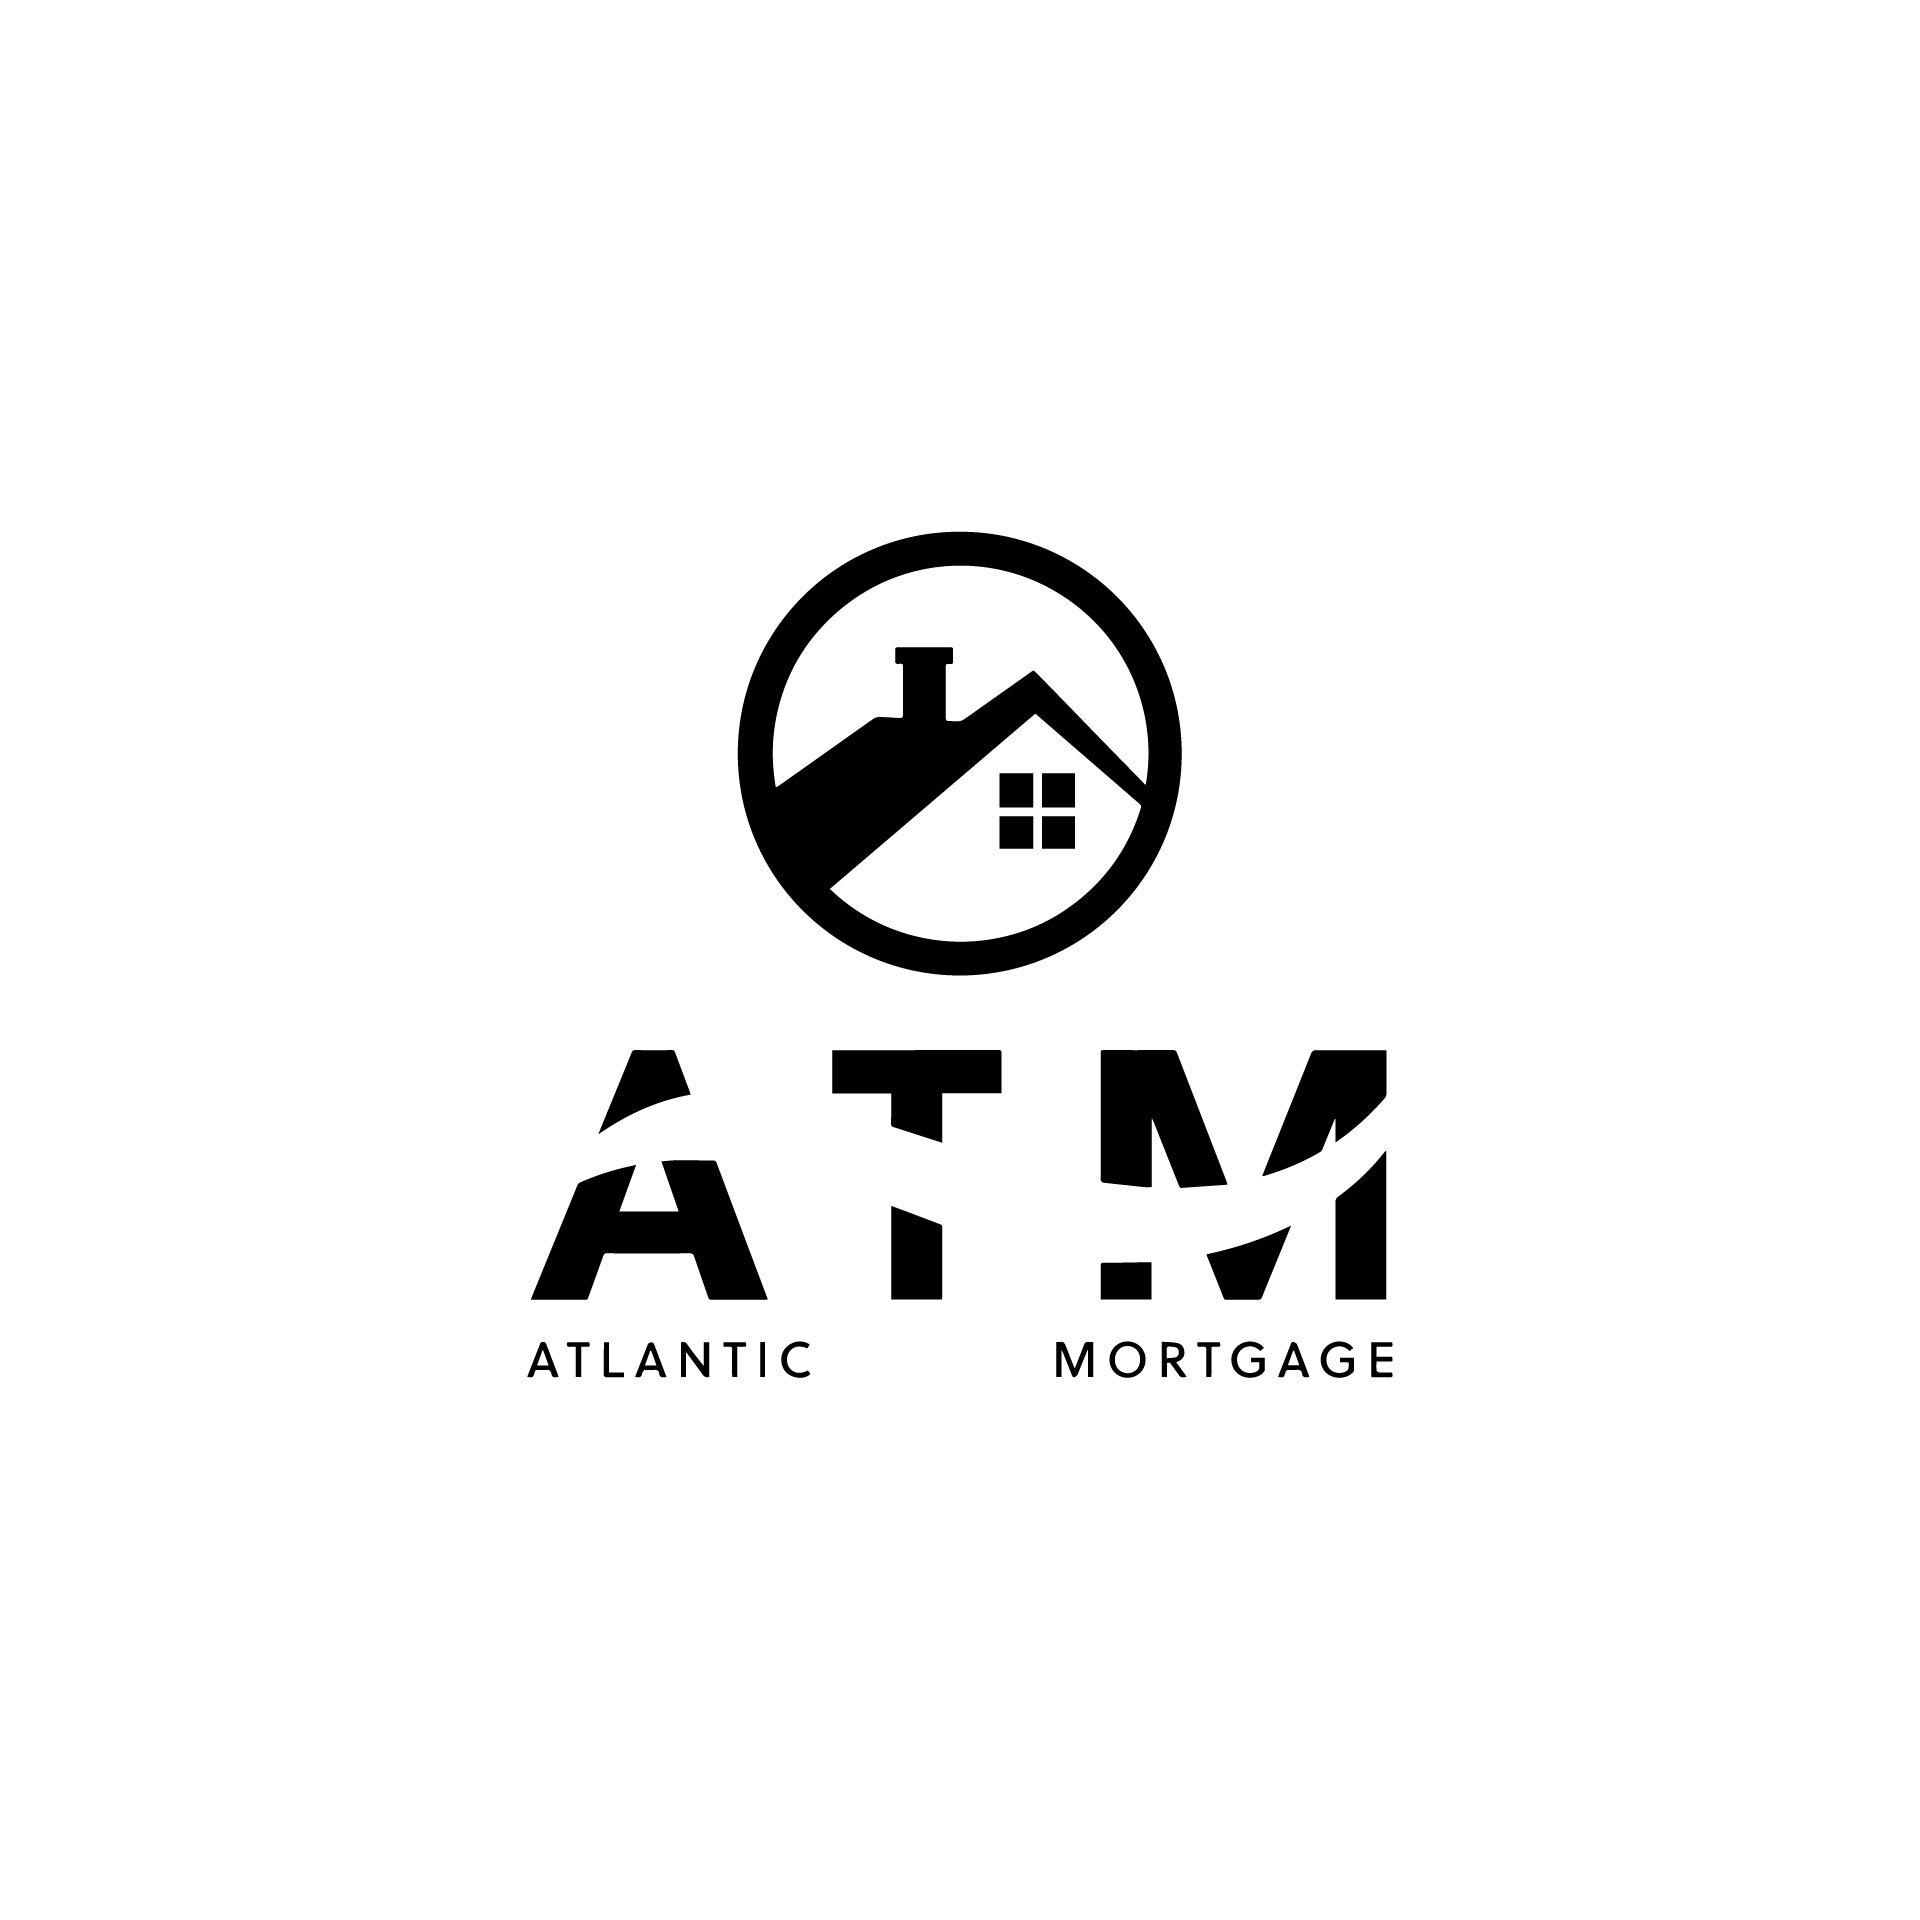 ADMark Logos 235136-18.jpg